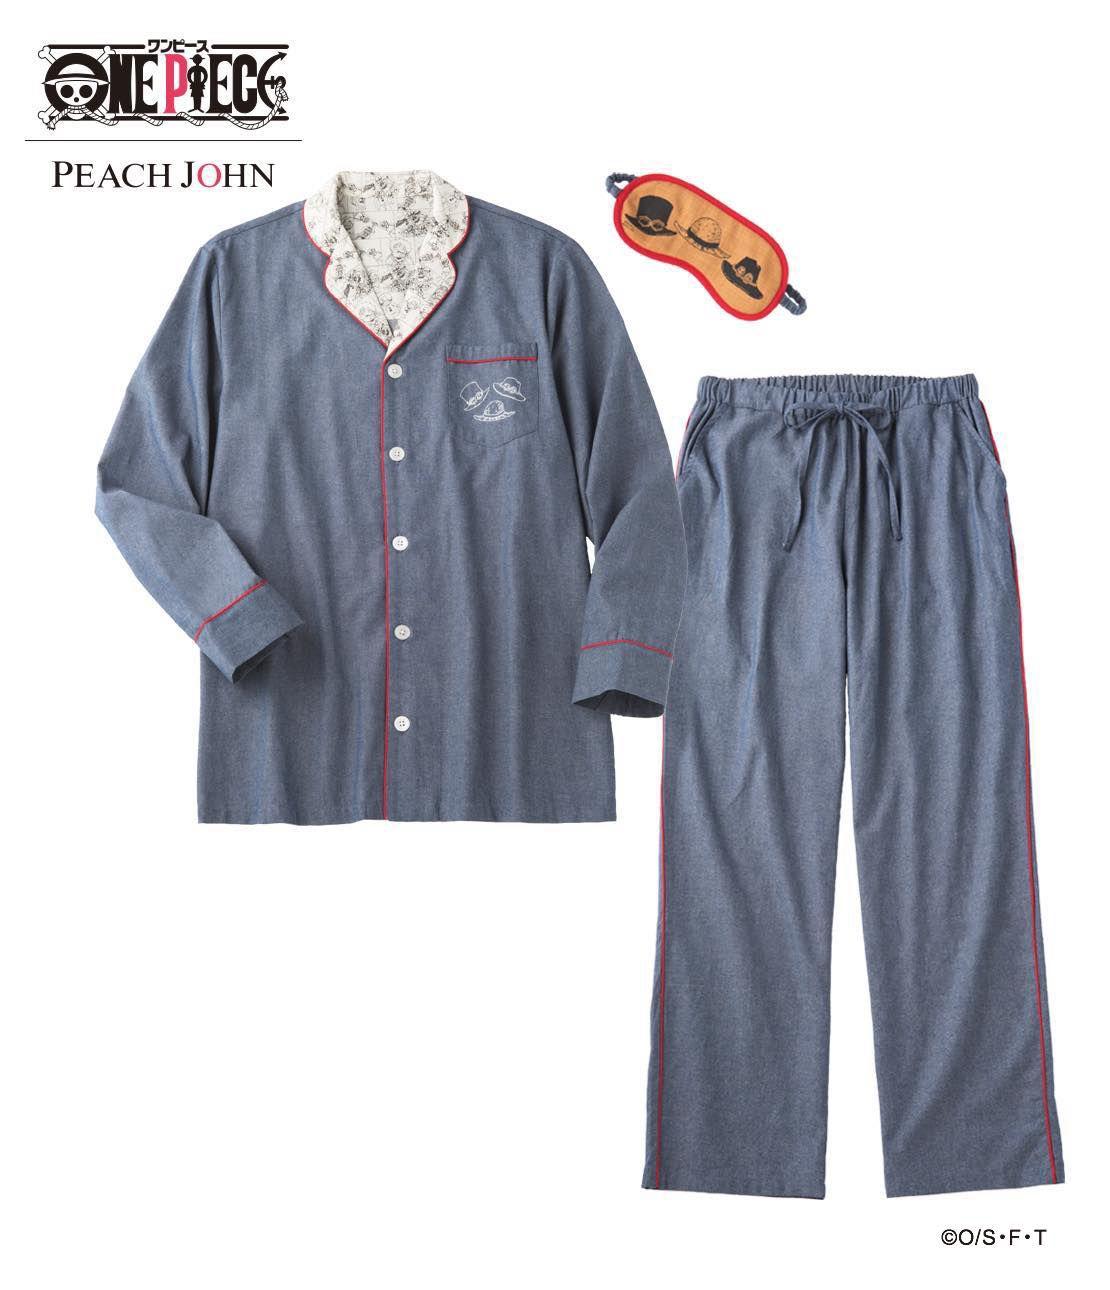 ONE PIECE LUFFY & LAW Unisex Shirt Pajama Set